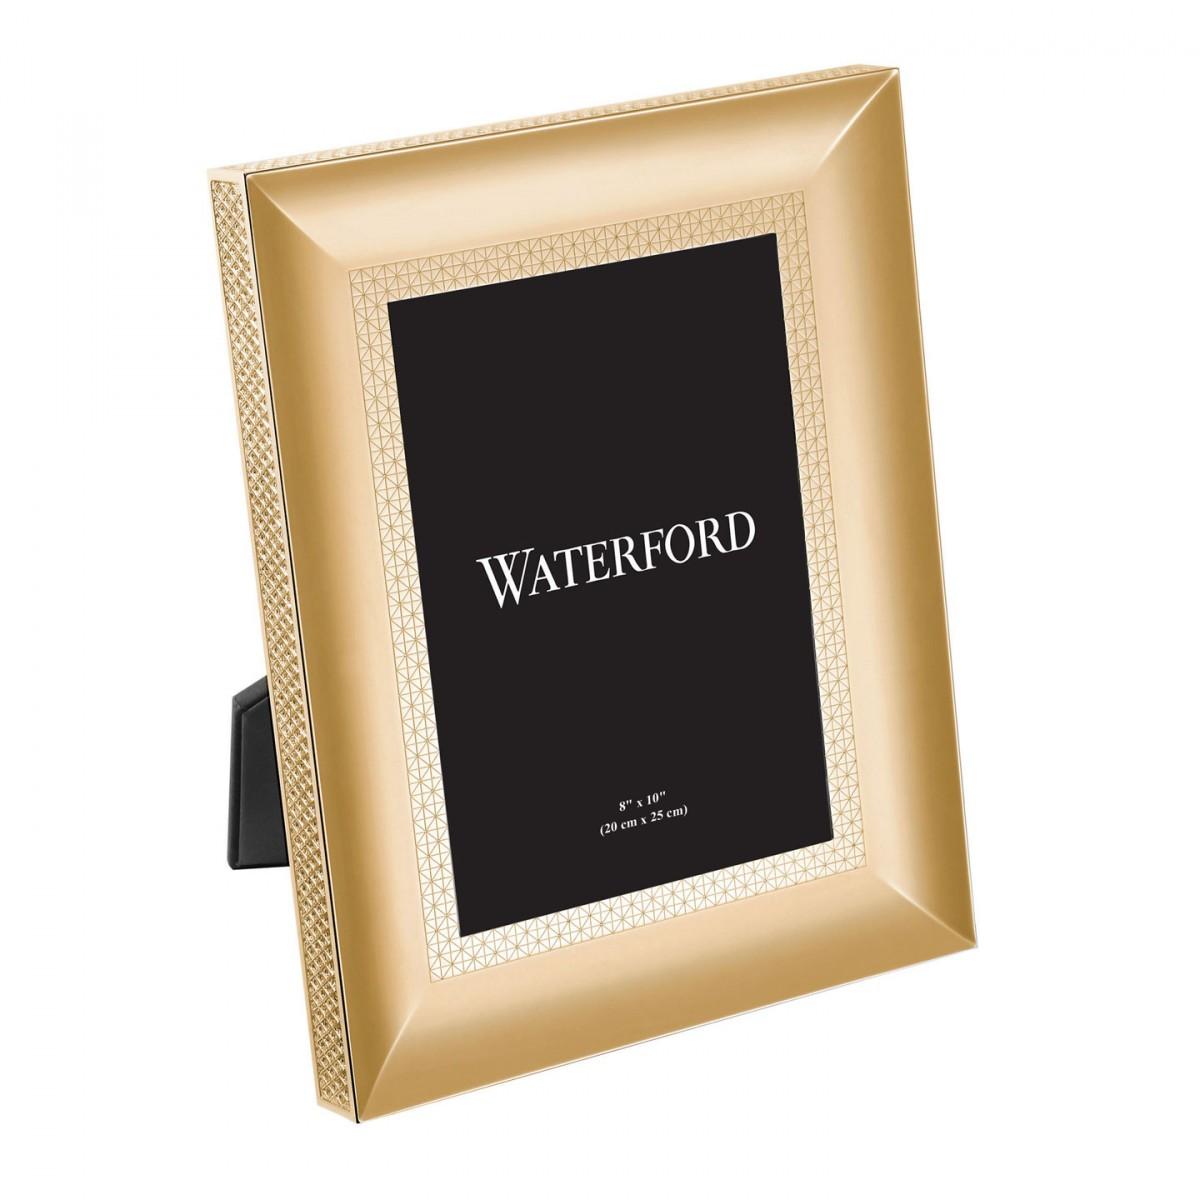 Waterford Lismore Diamond Gold Picture Frame 8x10 Borsheims